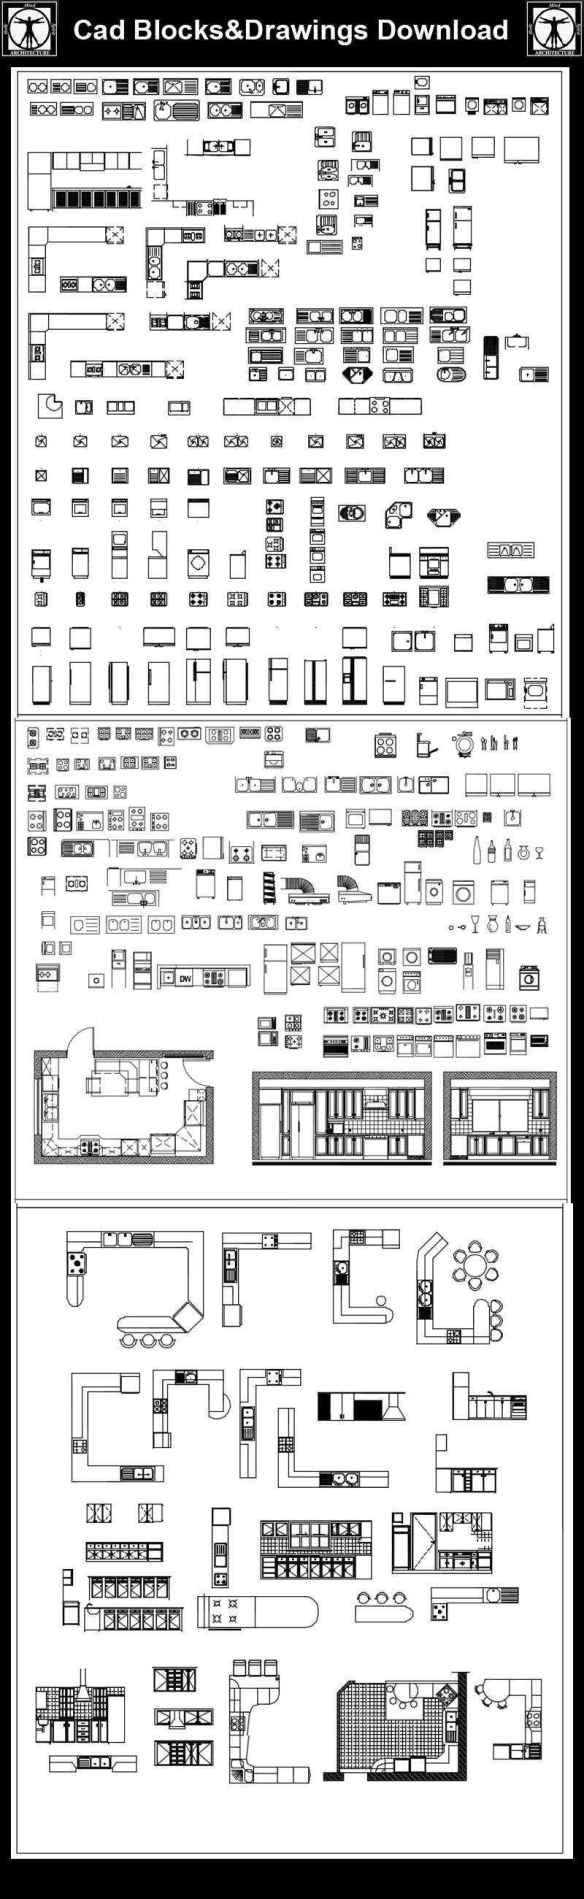 All Kitchen Blocks Bundle | Download CAD Blocks,Drawings,Details,3D on swf files, stl files, autocad icon files, eps files, 3ds files, zip files, obj files, collada files, jpeg files, tiff files,